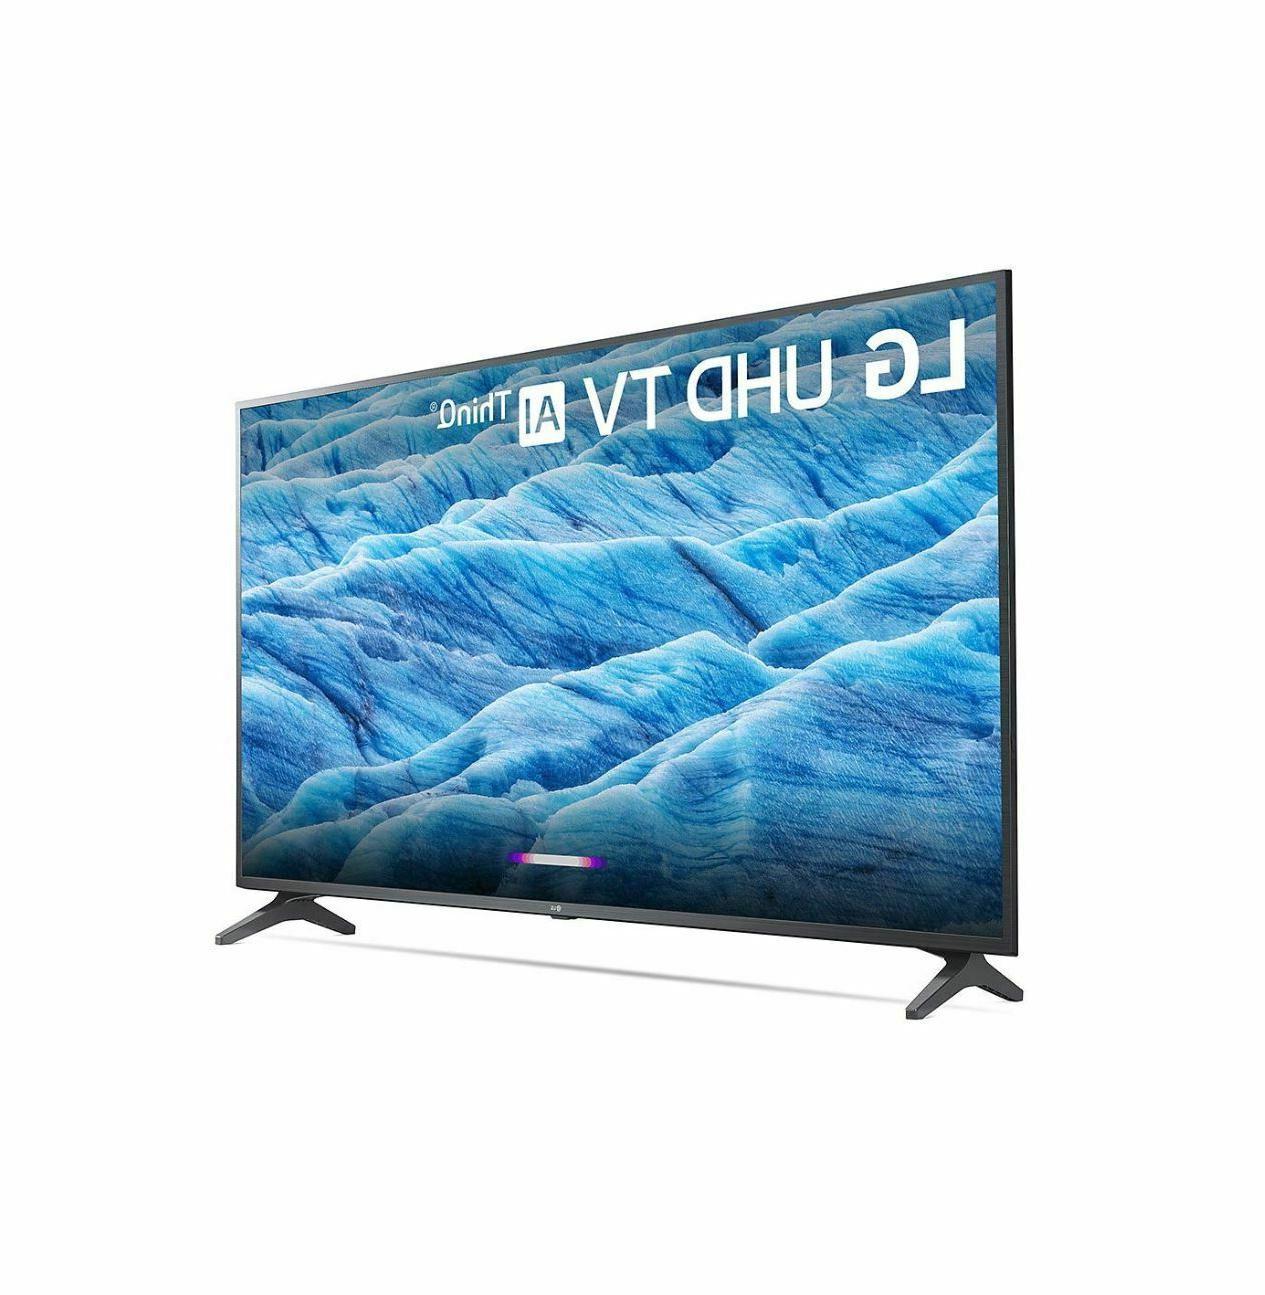 55 inch 4k ultra hd smart hdr